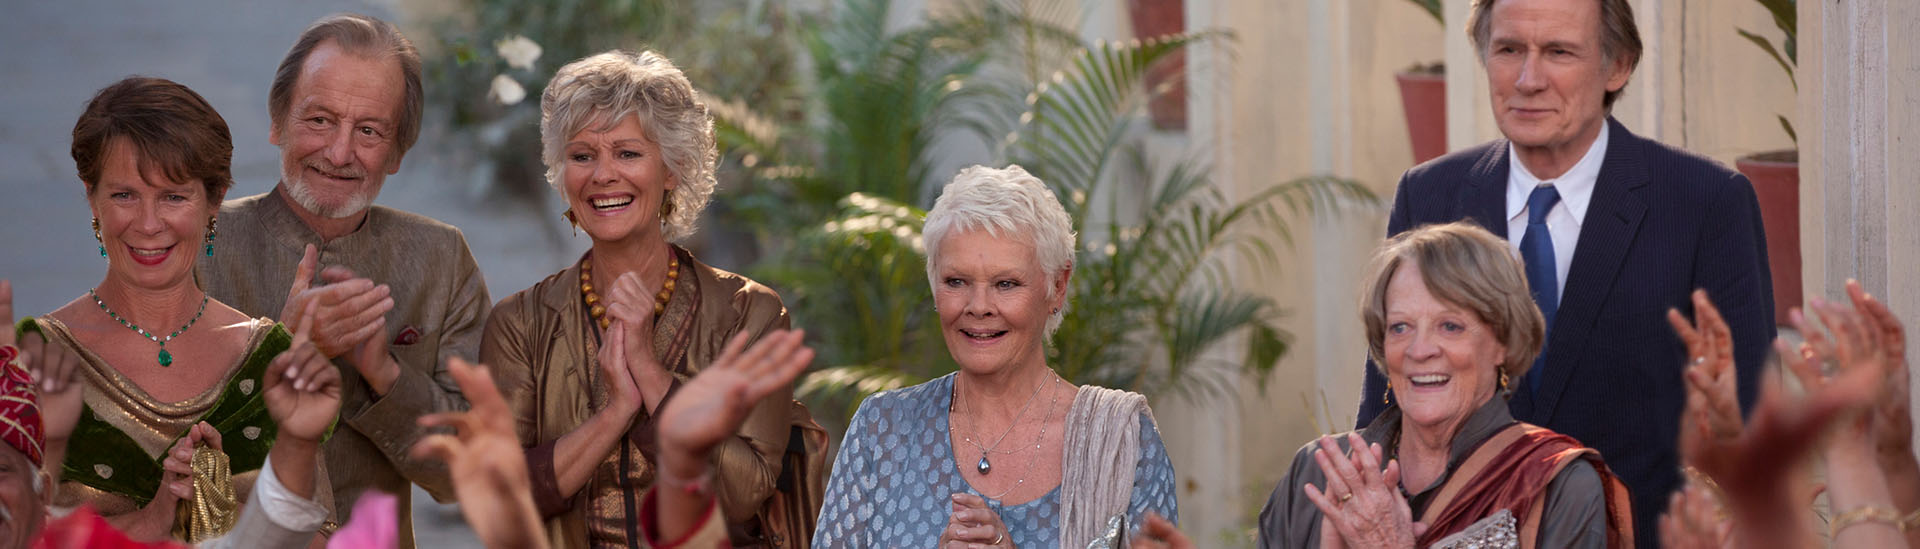 Baner filmu 'Drugi Hotel Marigold'